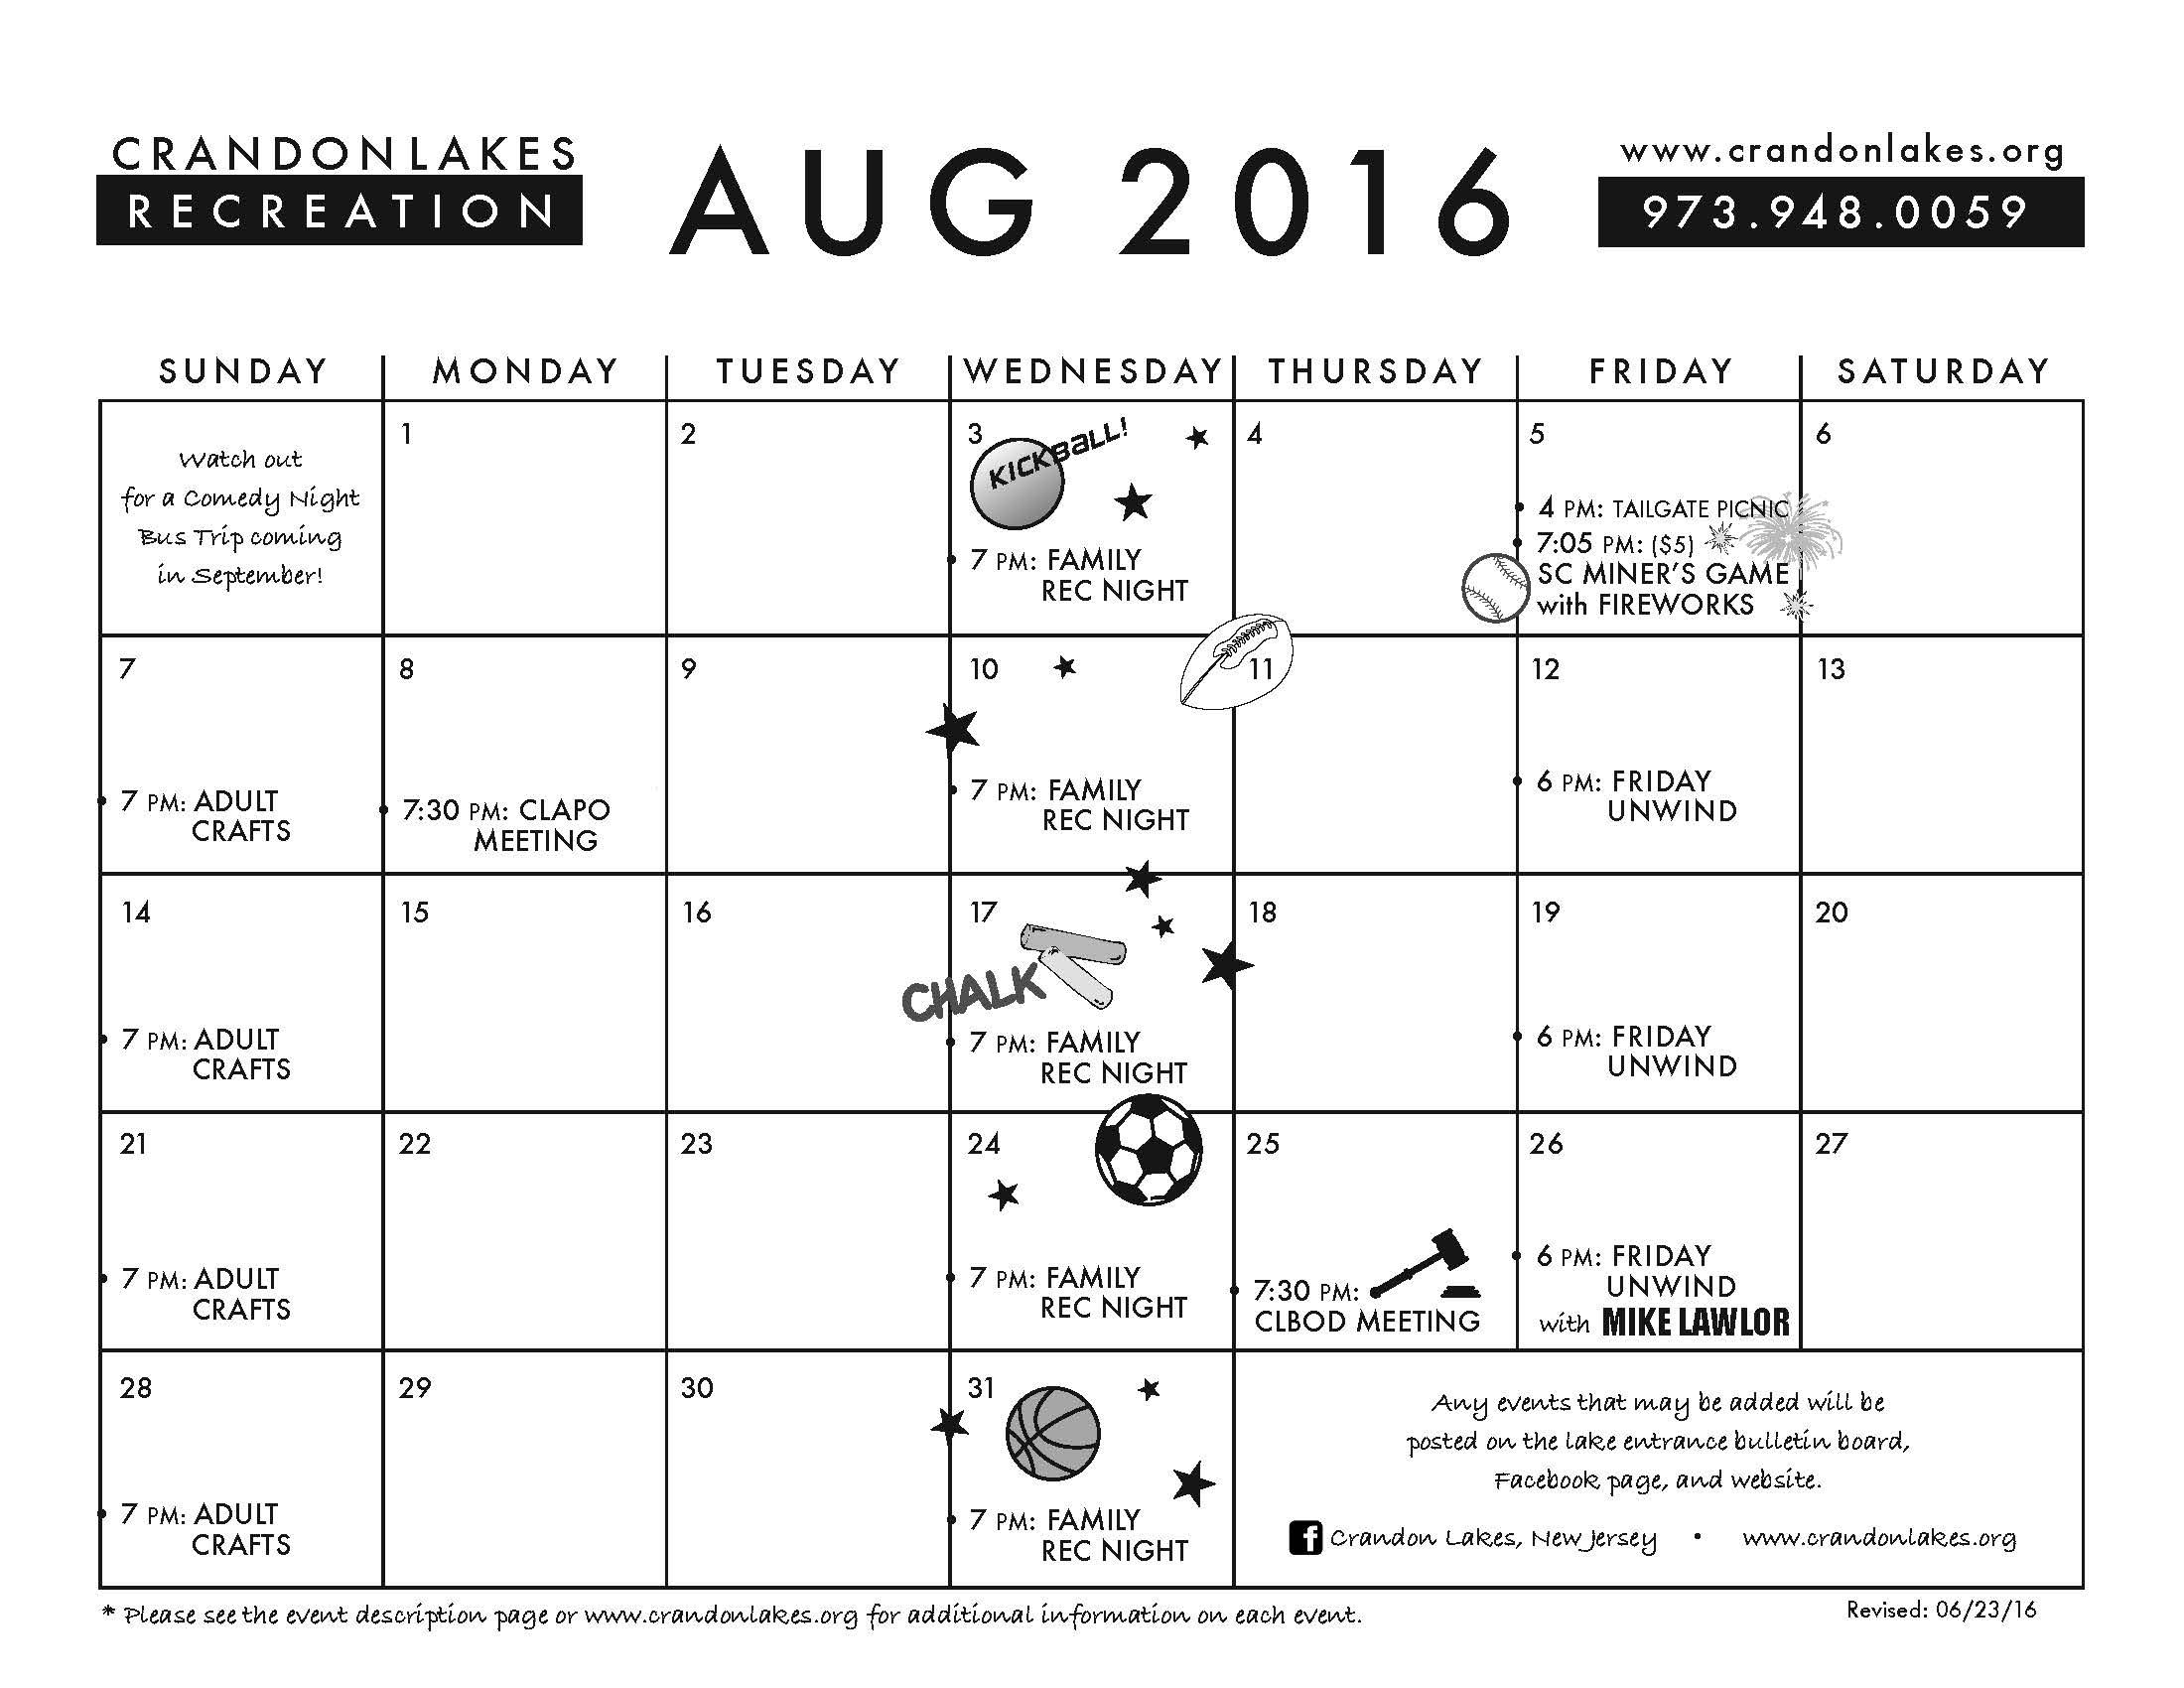 August 2016 Crandon Lakes Recreation Calendar